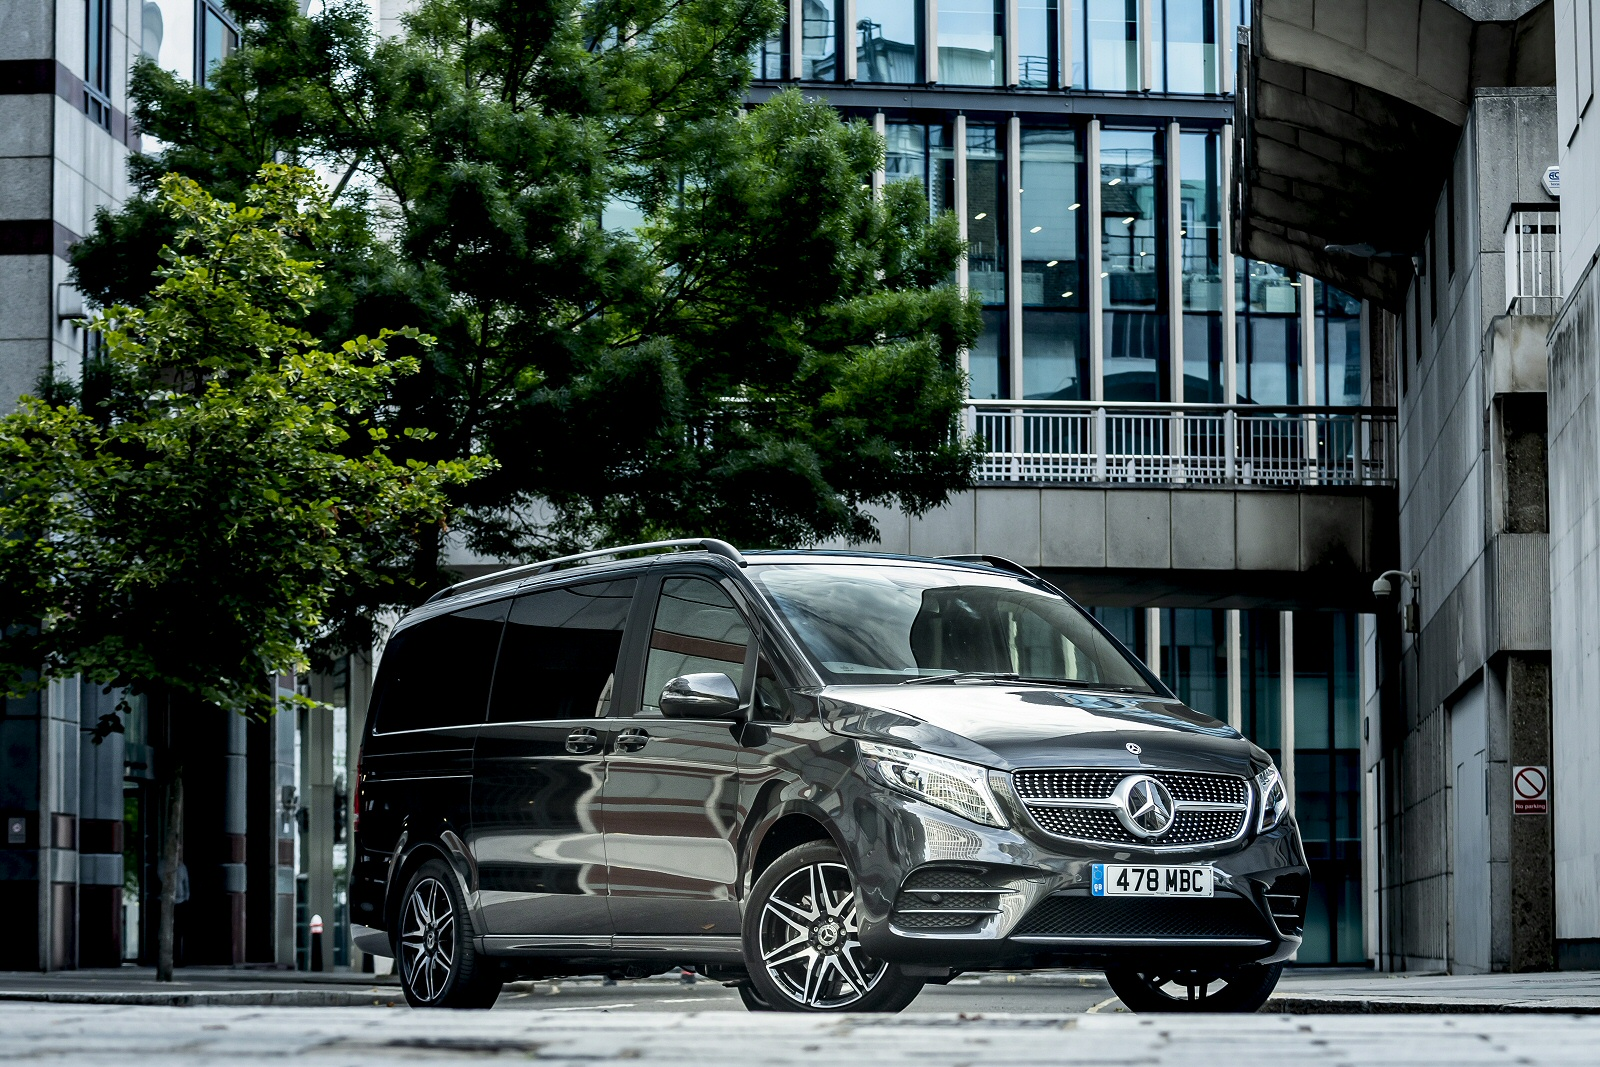 45d693211 New Mercedes-Benz V-Class V220 d Marco Polo Horizon Sport 4dr Auto [Long]  Diesel Estate for Sale | Vertu Mercedes-Benz